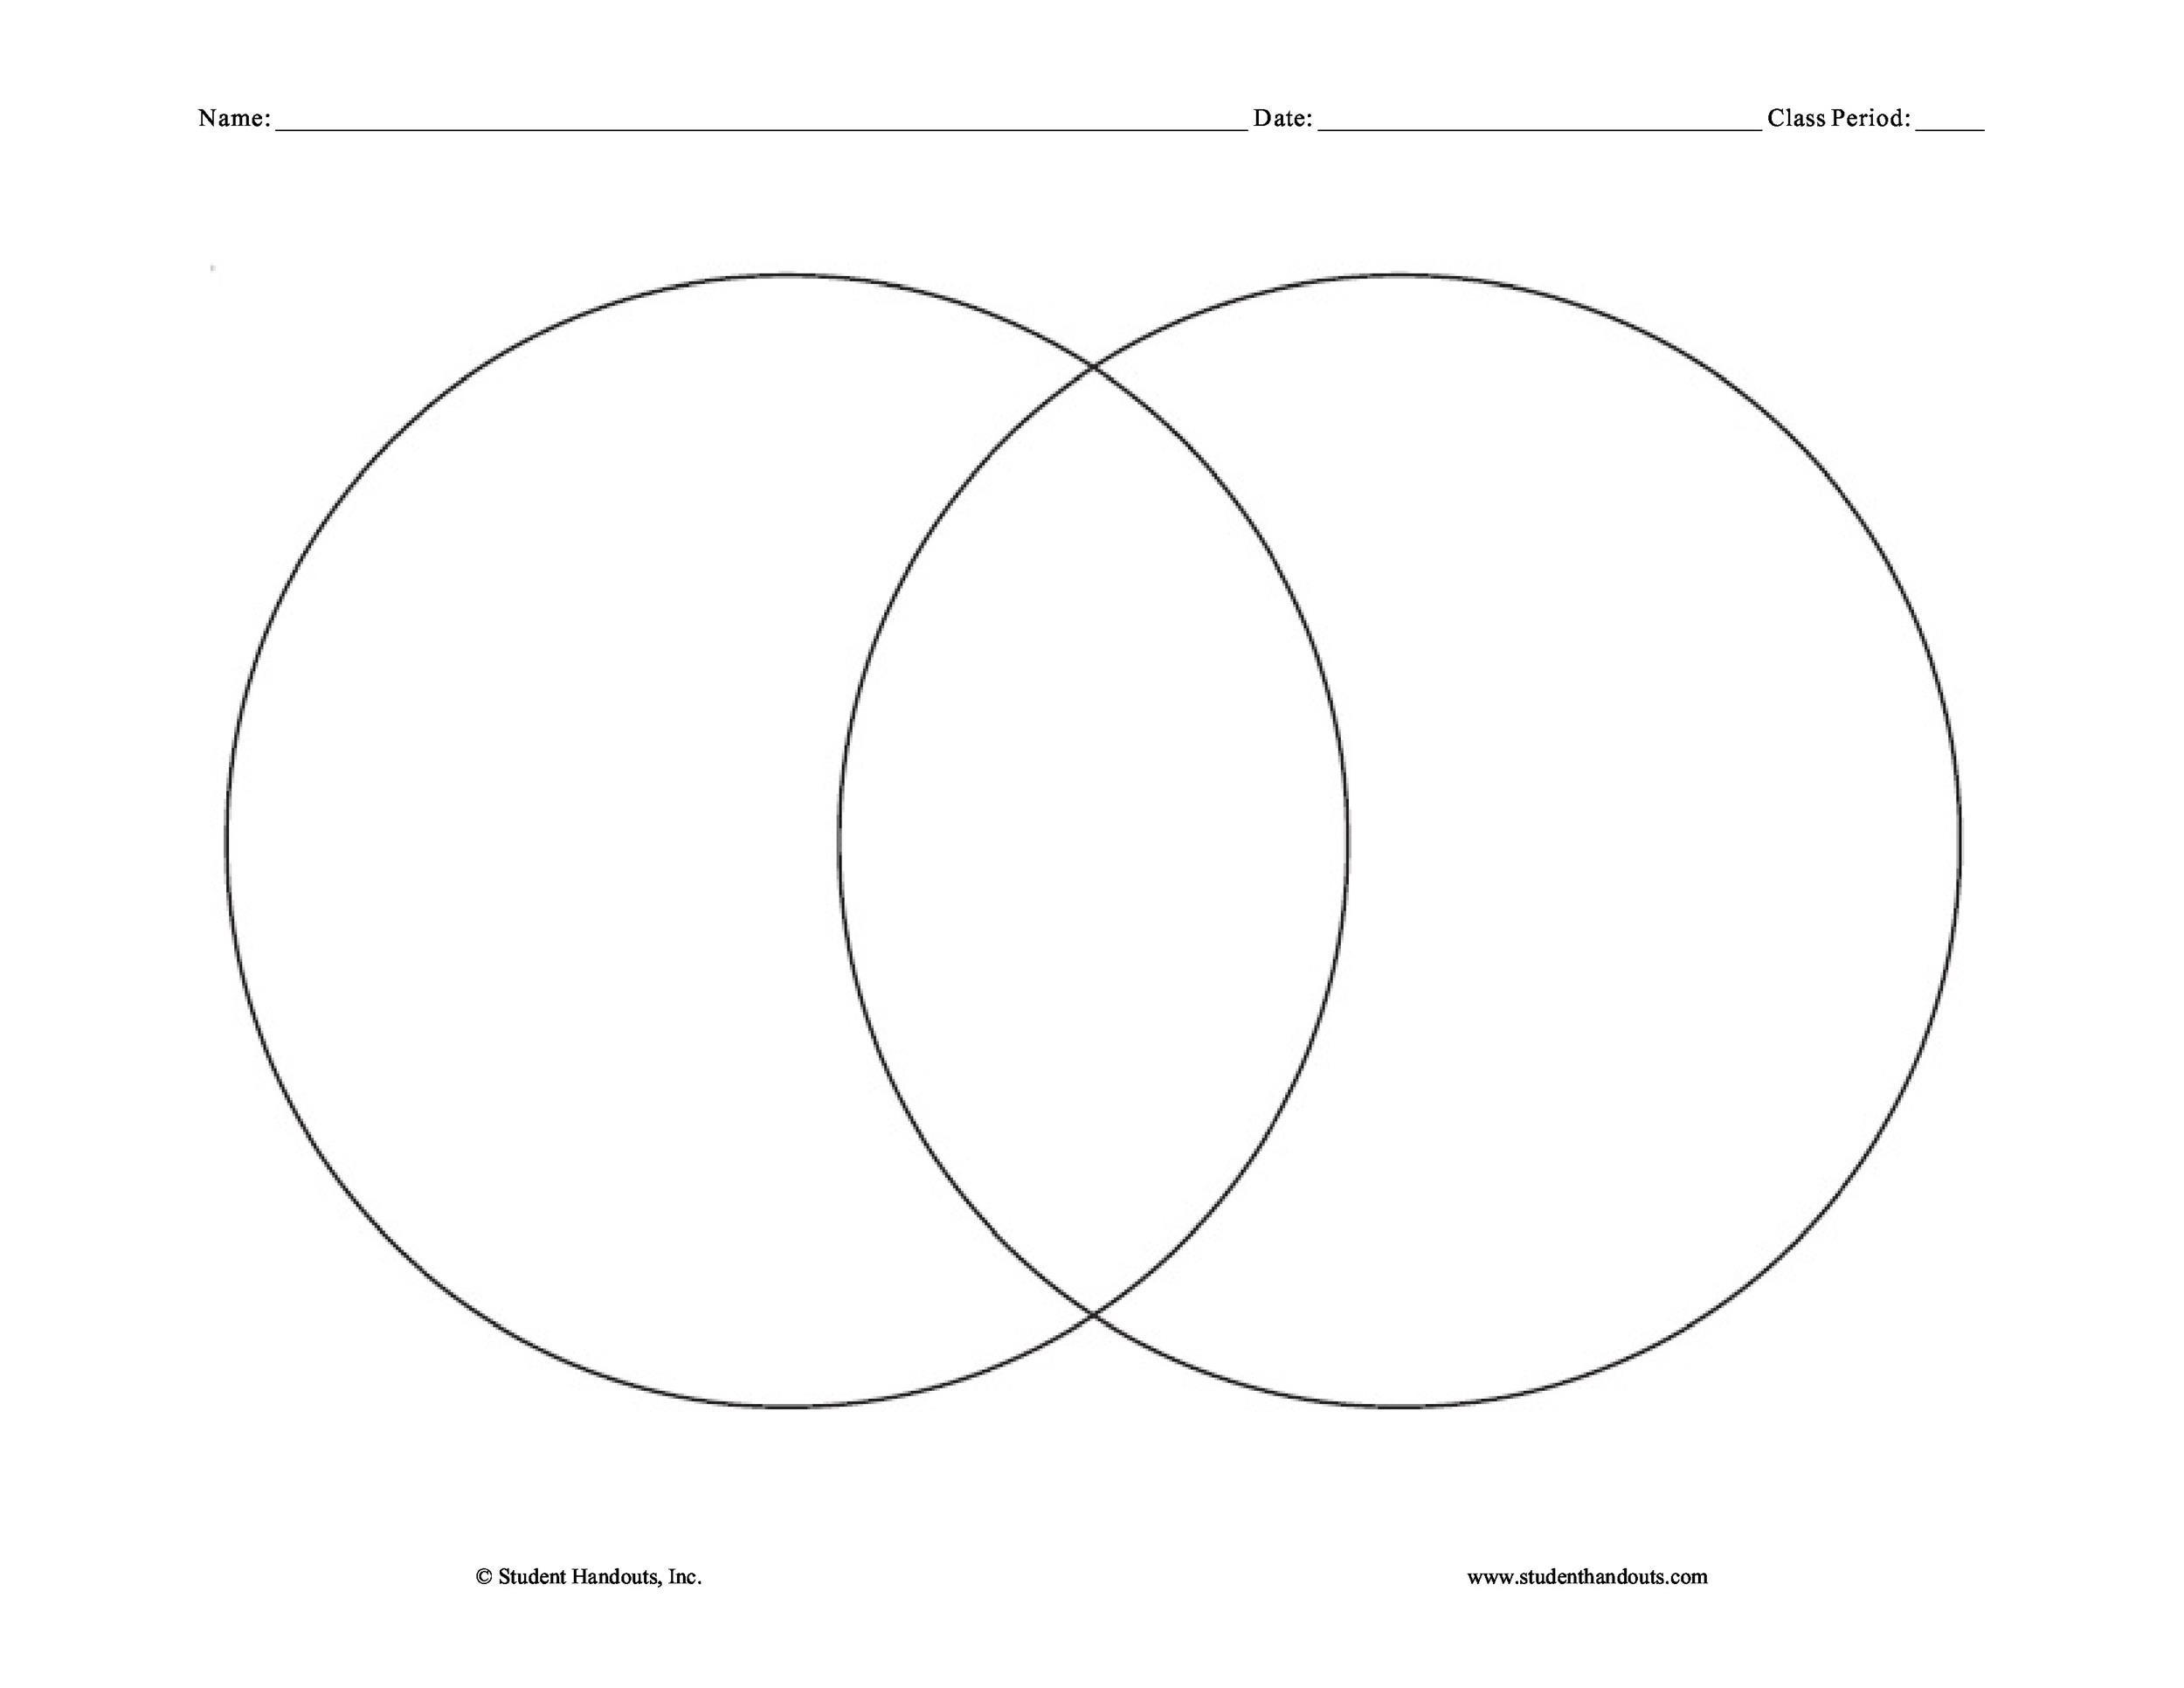 40+ Free Venn Diagram Templates (Word, PDF) ᐅ TemplateLab